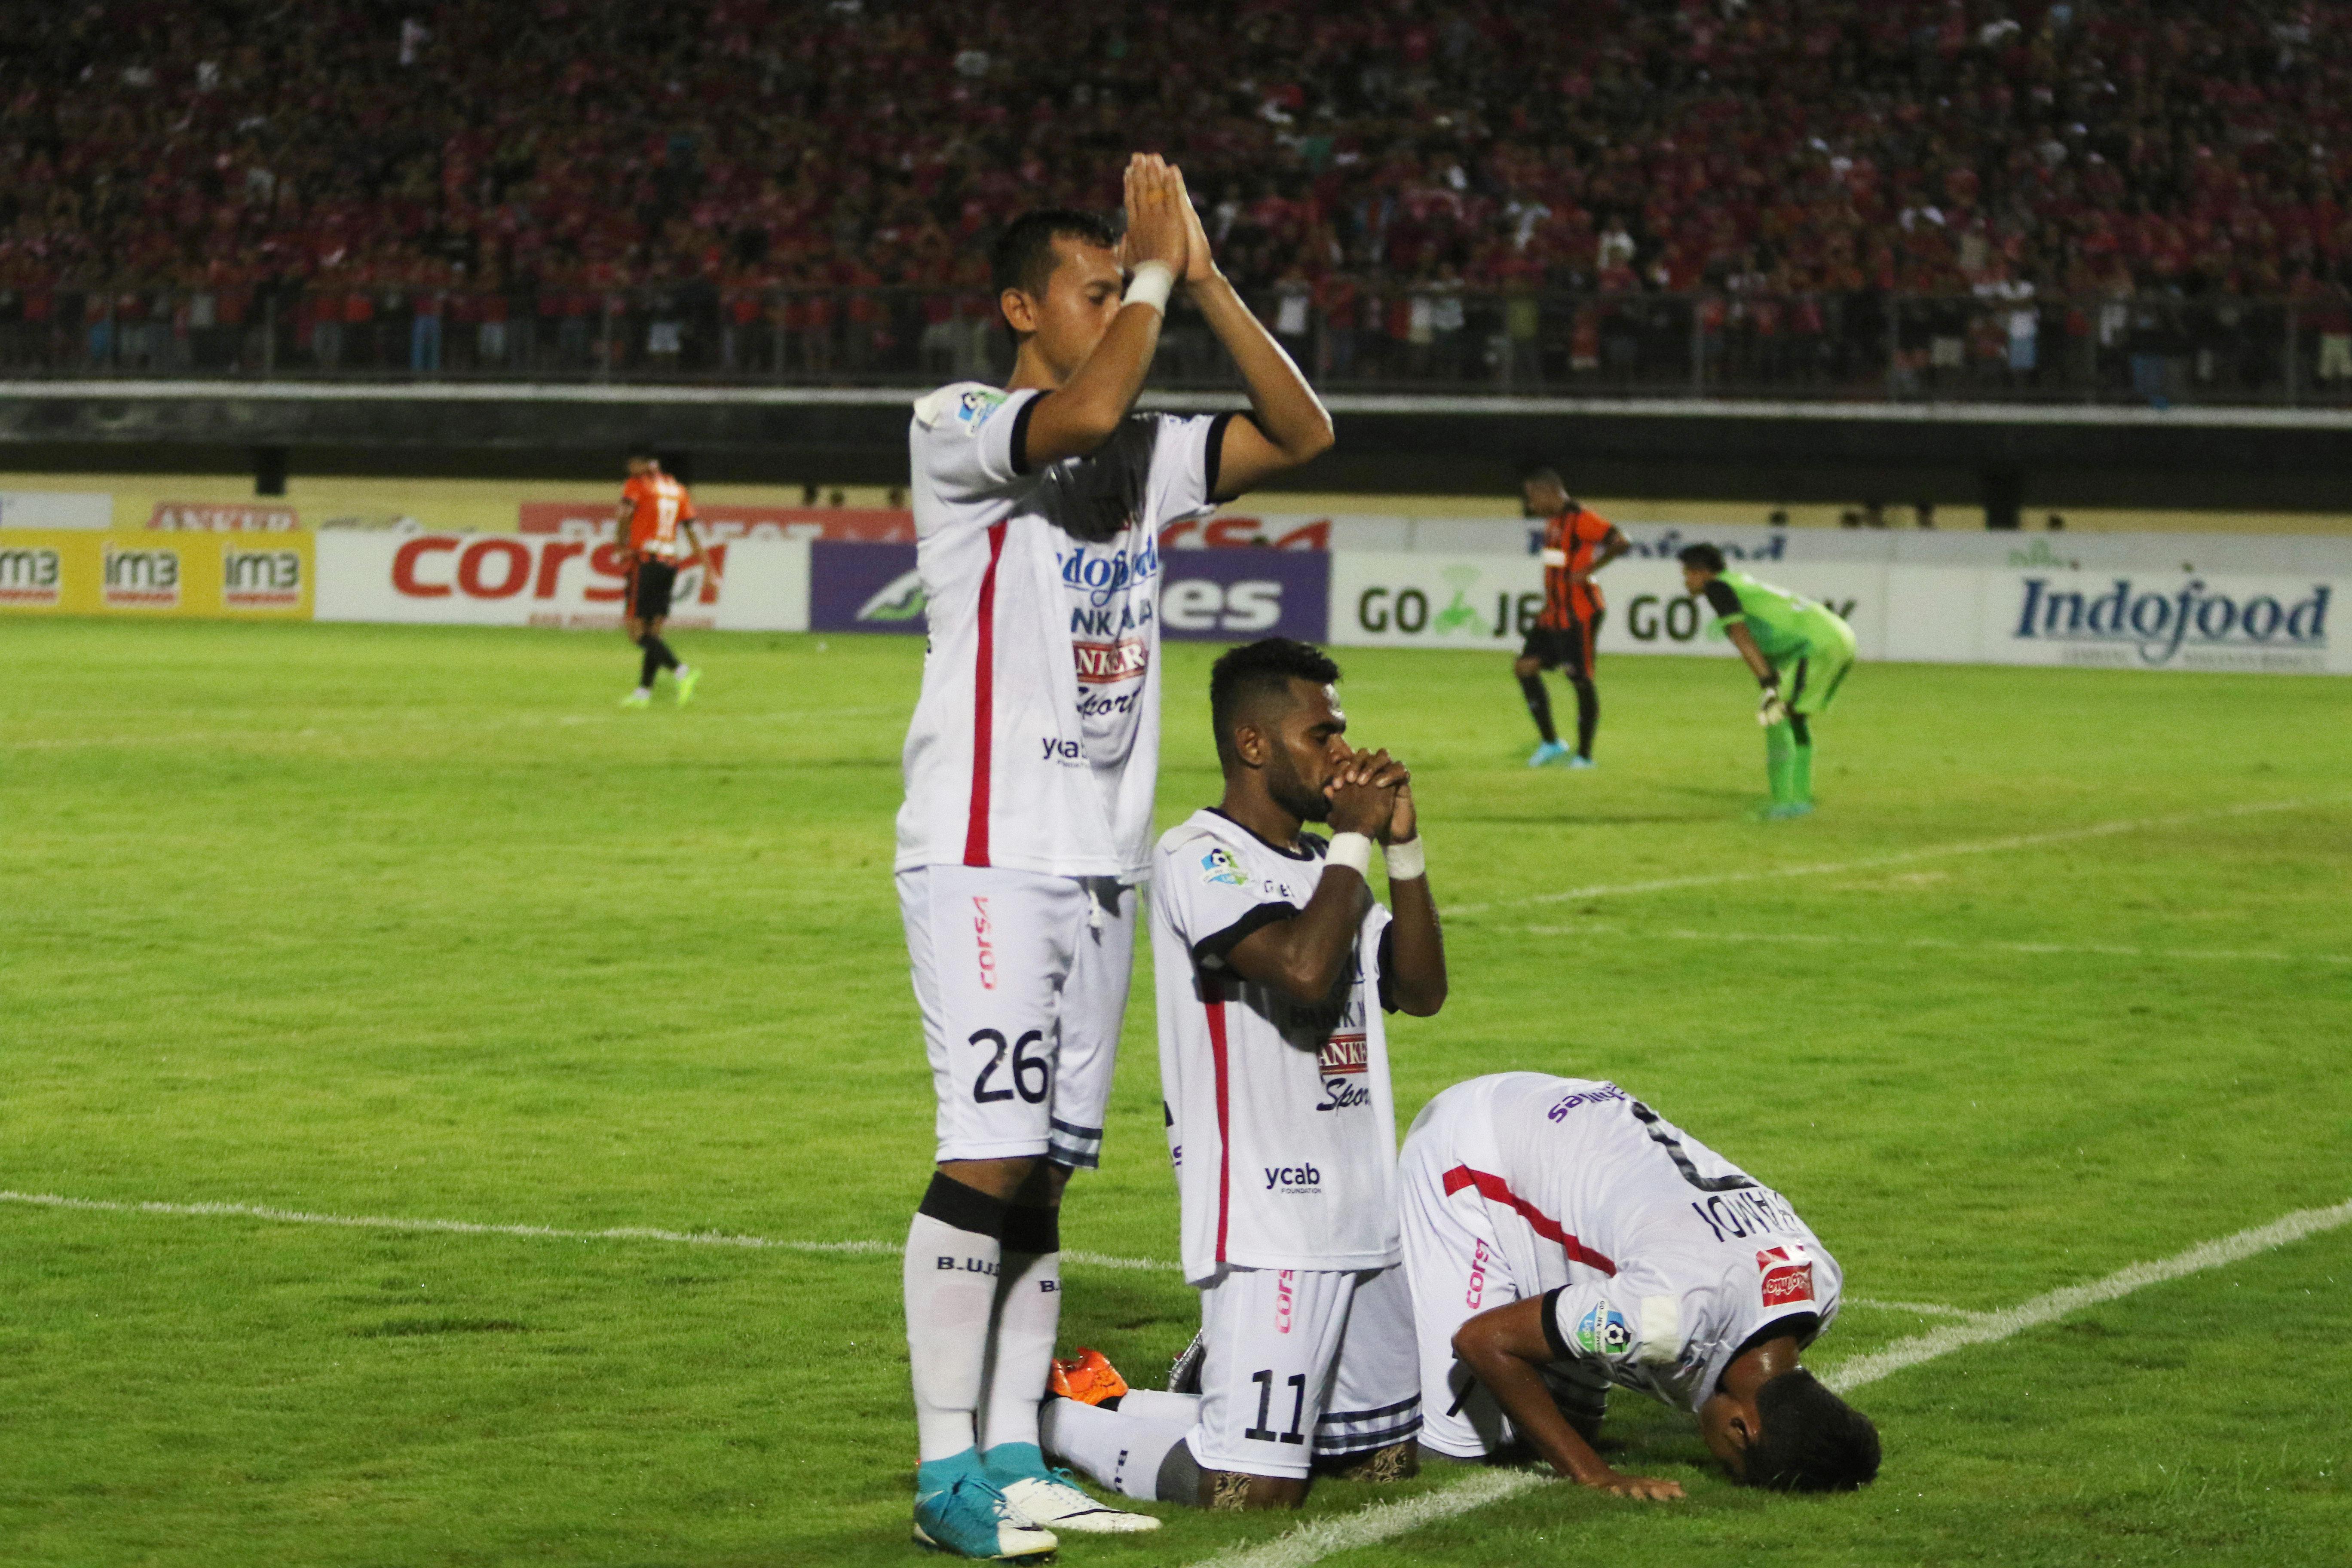 Bali United soccer players Ngurah Nanak, Yabes Roni and Miftahul Hamdi pray regarding their religion as they celebrate goals